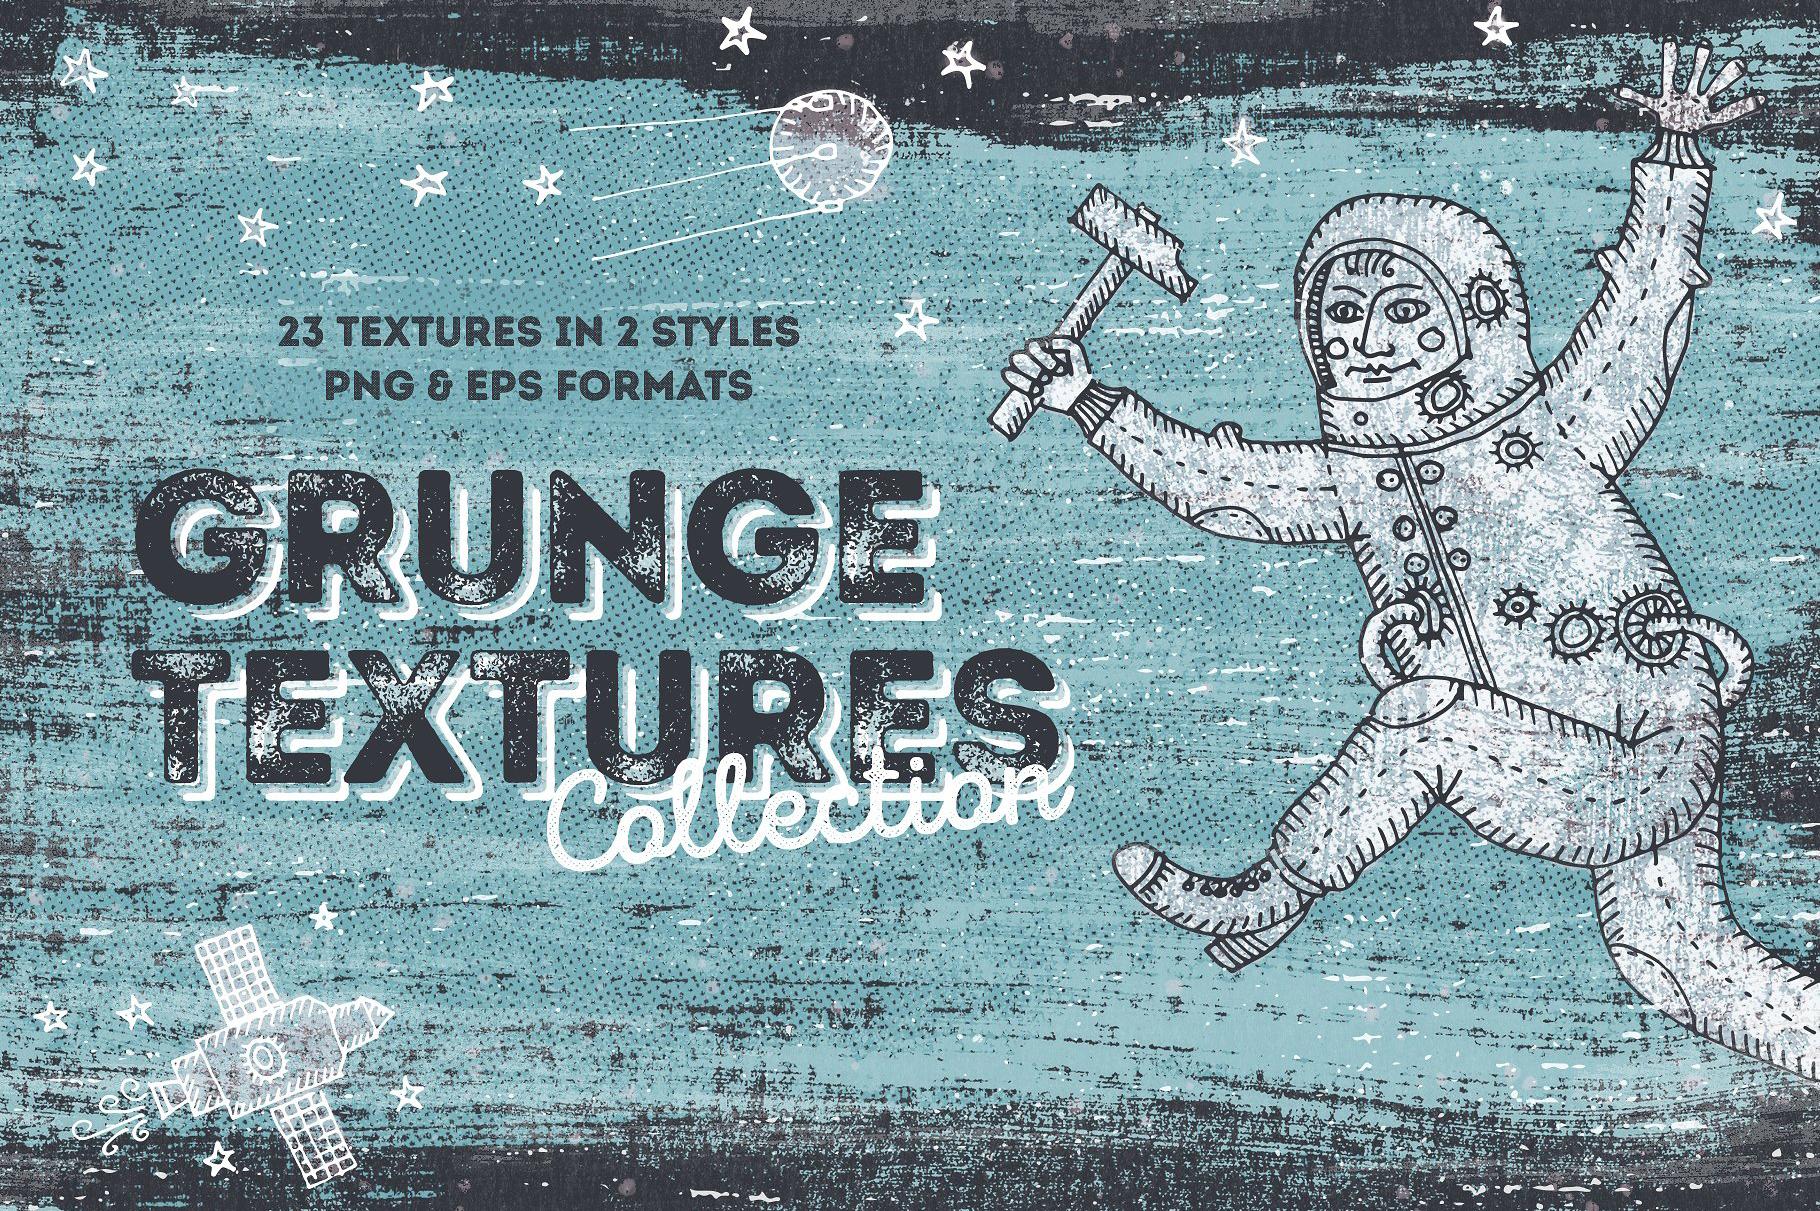 Hand-Drawn Grunge Textures Collection